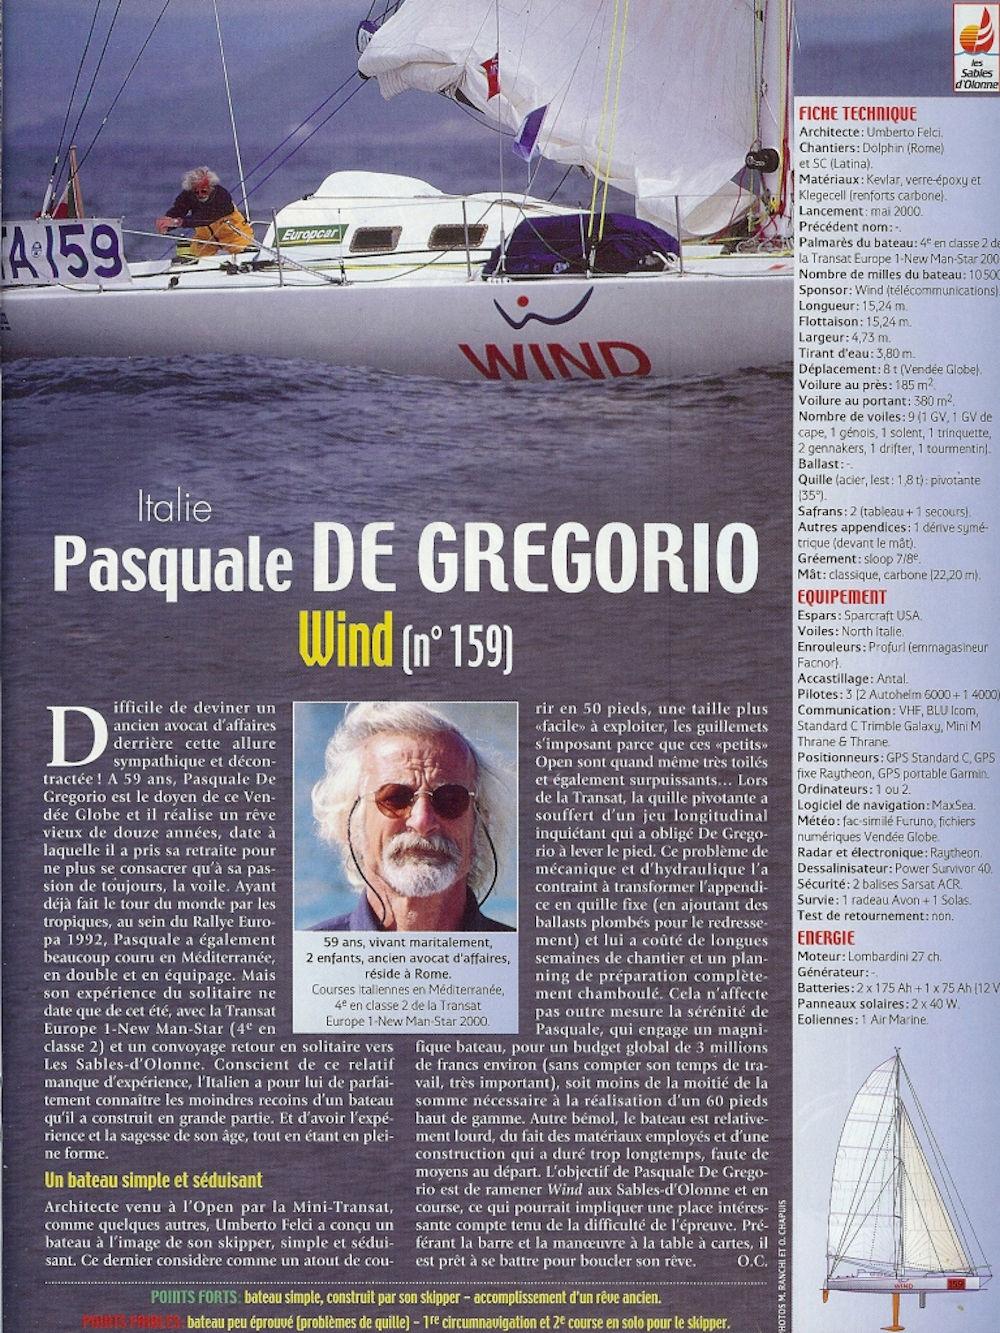 Pasquale De Gregorio - Scheda iscrizione Vendée Globe